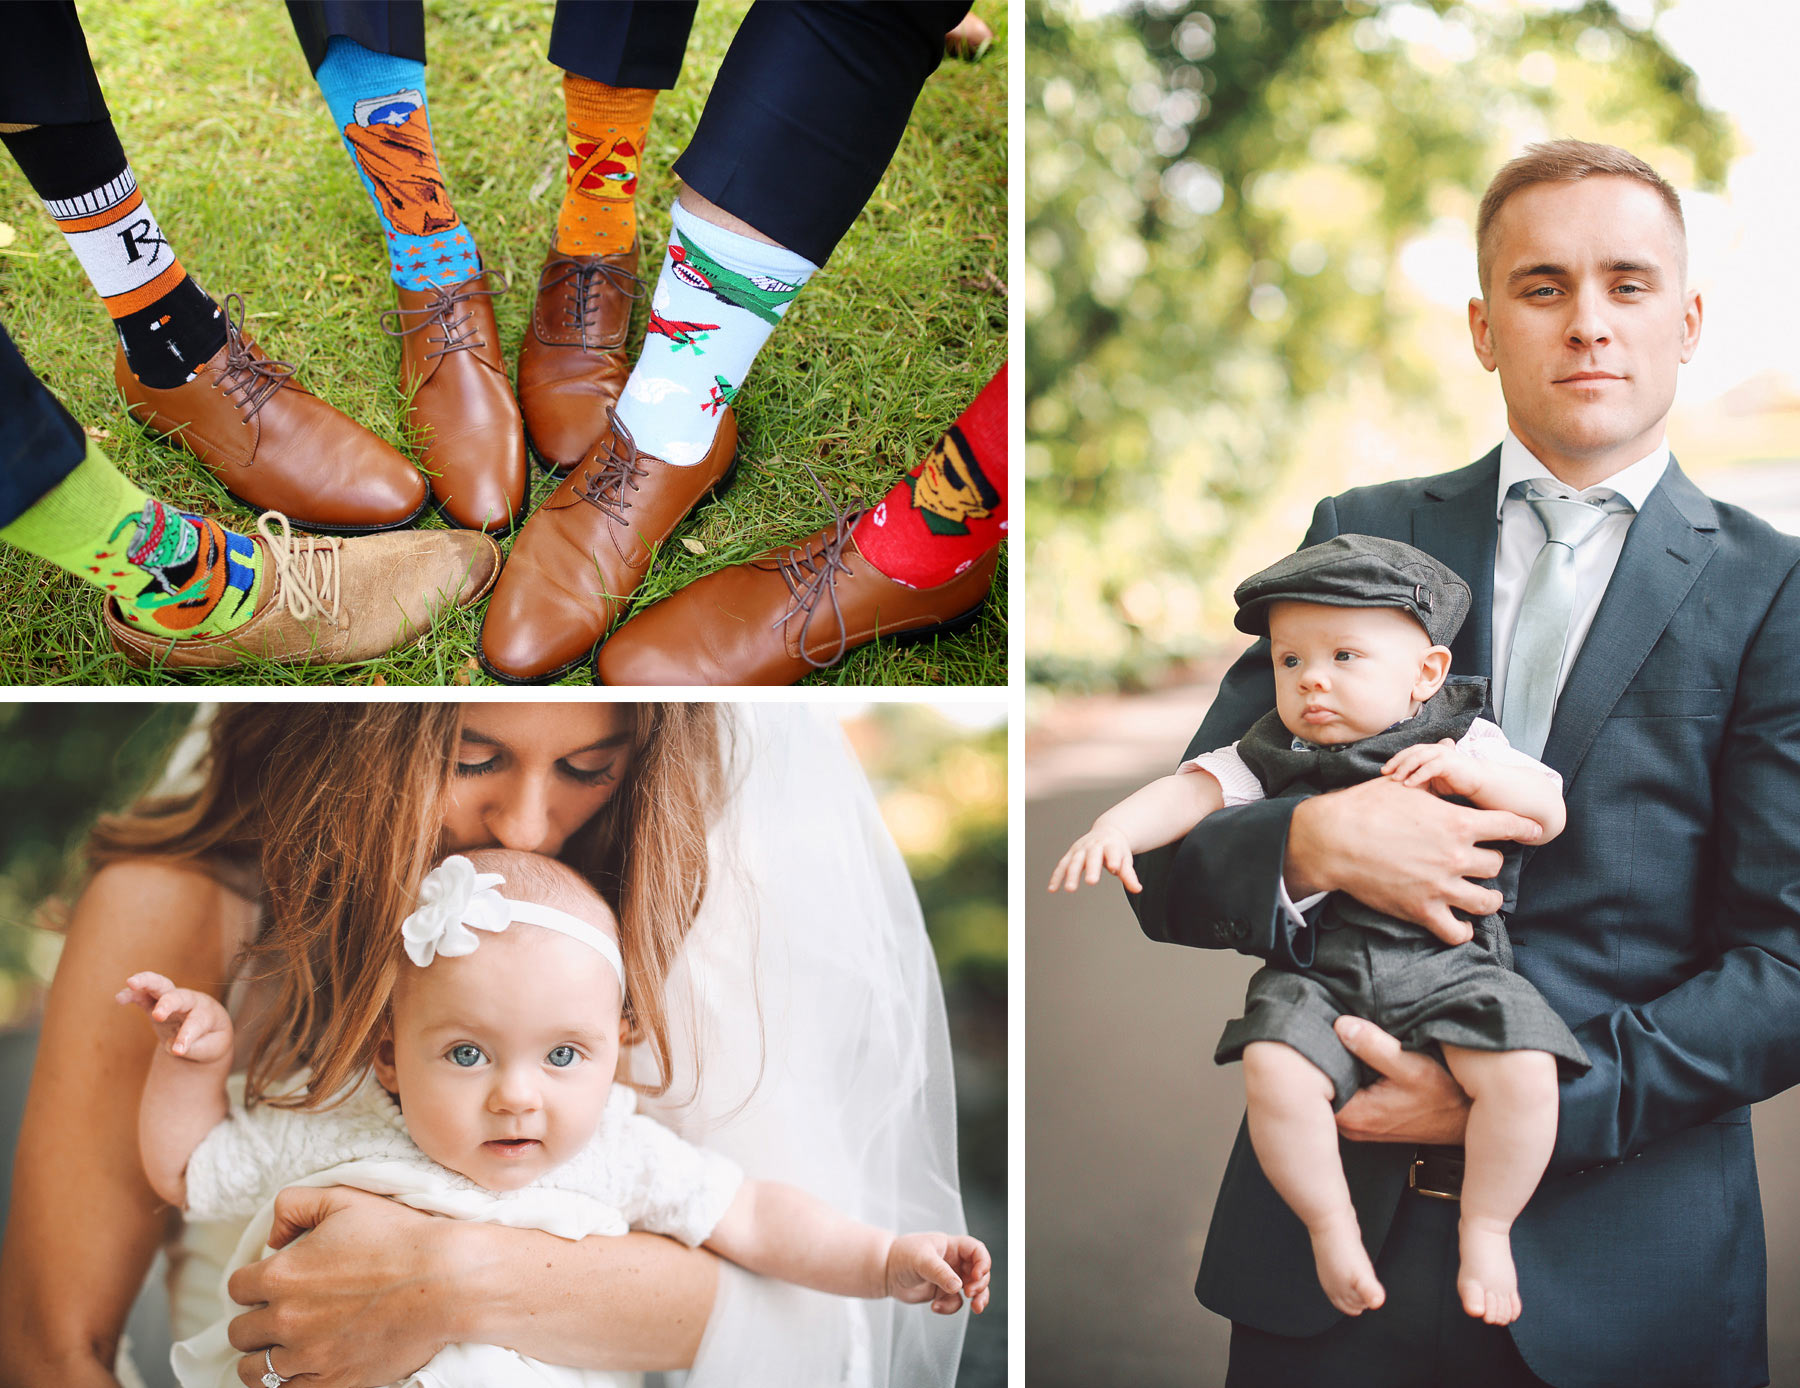 16-Dellwood-Minnesota-Wedding-Photographer-by-Andrew-Vick-Photography-Summer-Country-Club-Bride-Groom-Groomsmen-Socks-Baby-Vintage-Sarah-and-Landon.jpg